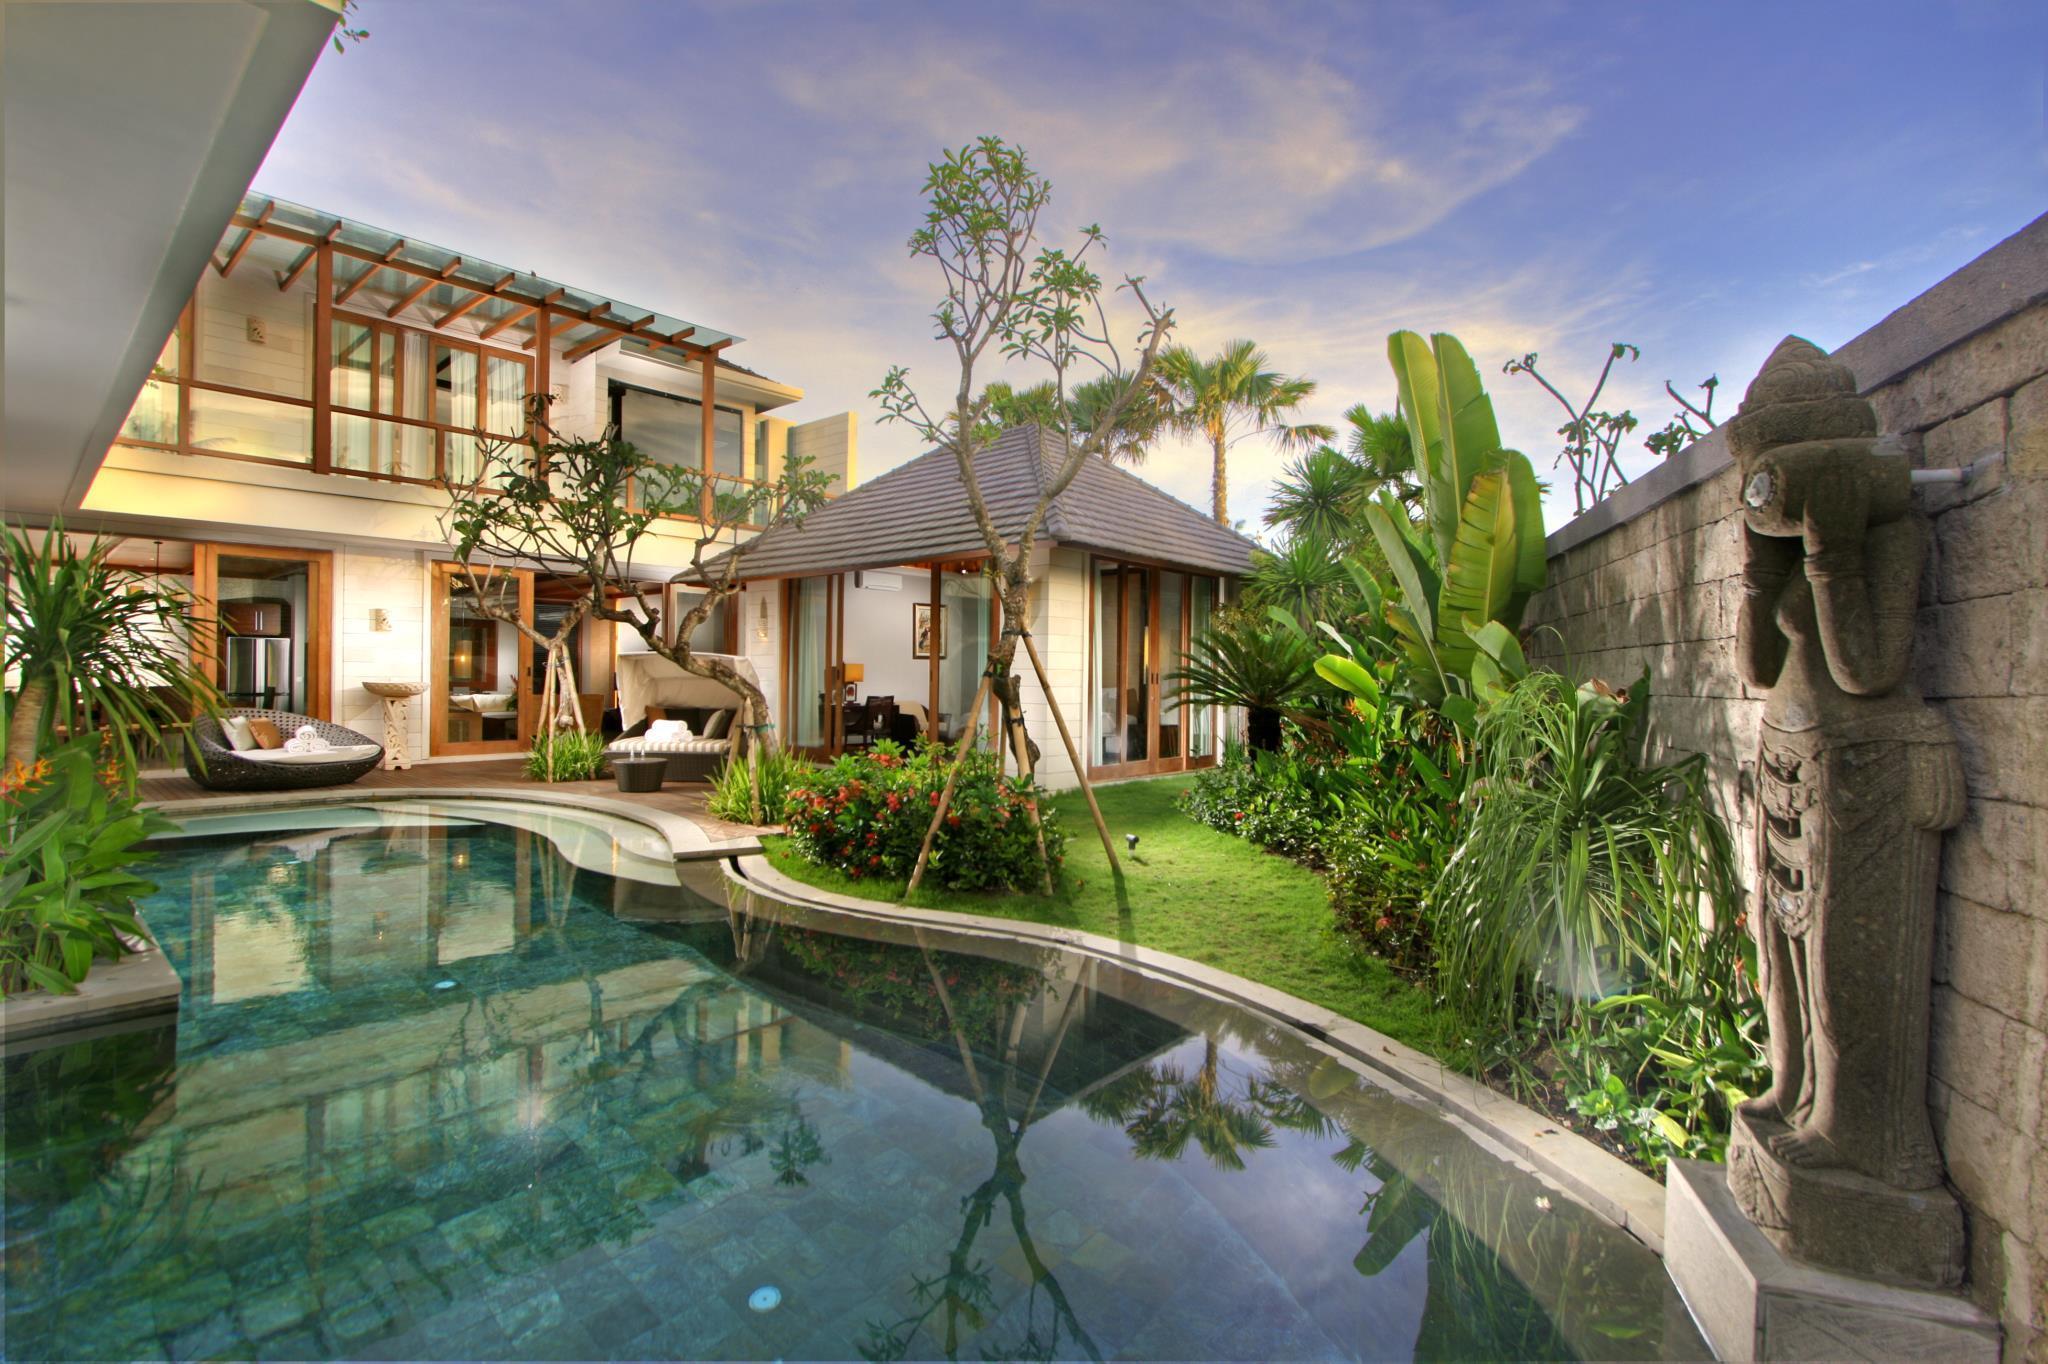 Best price on the akasha luxury villas and boutique hotel for Boutique hotel uzuri villa